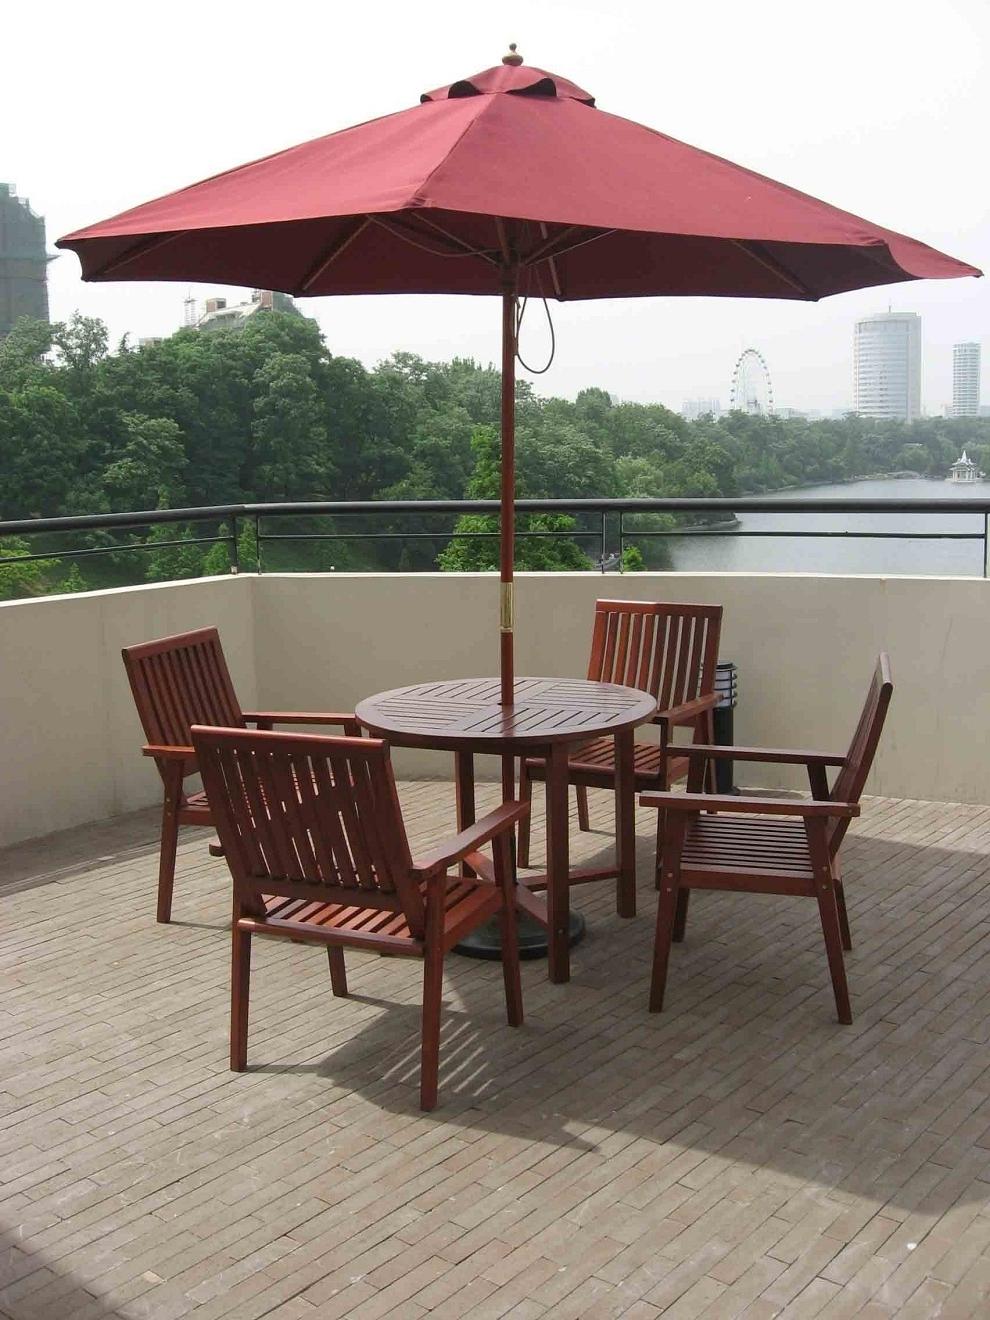 Patio Tables With Umbrellas Regarding Trendy Patio Outdooratio Table Chairs And Umbrellas Umbrella Set Restaurant (View 18 of 20)